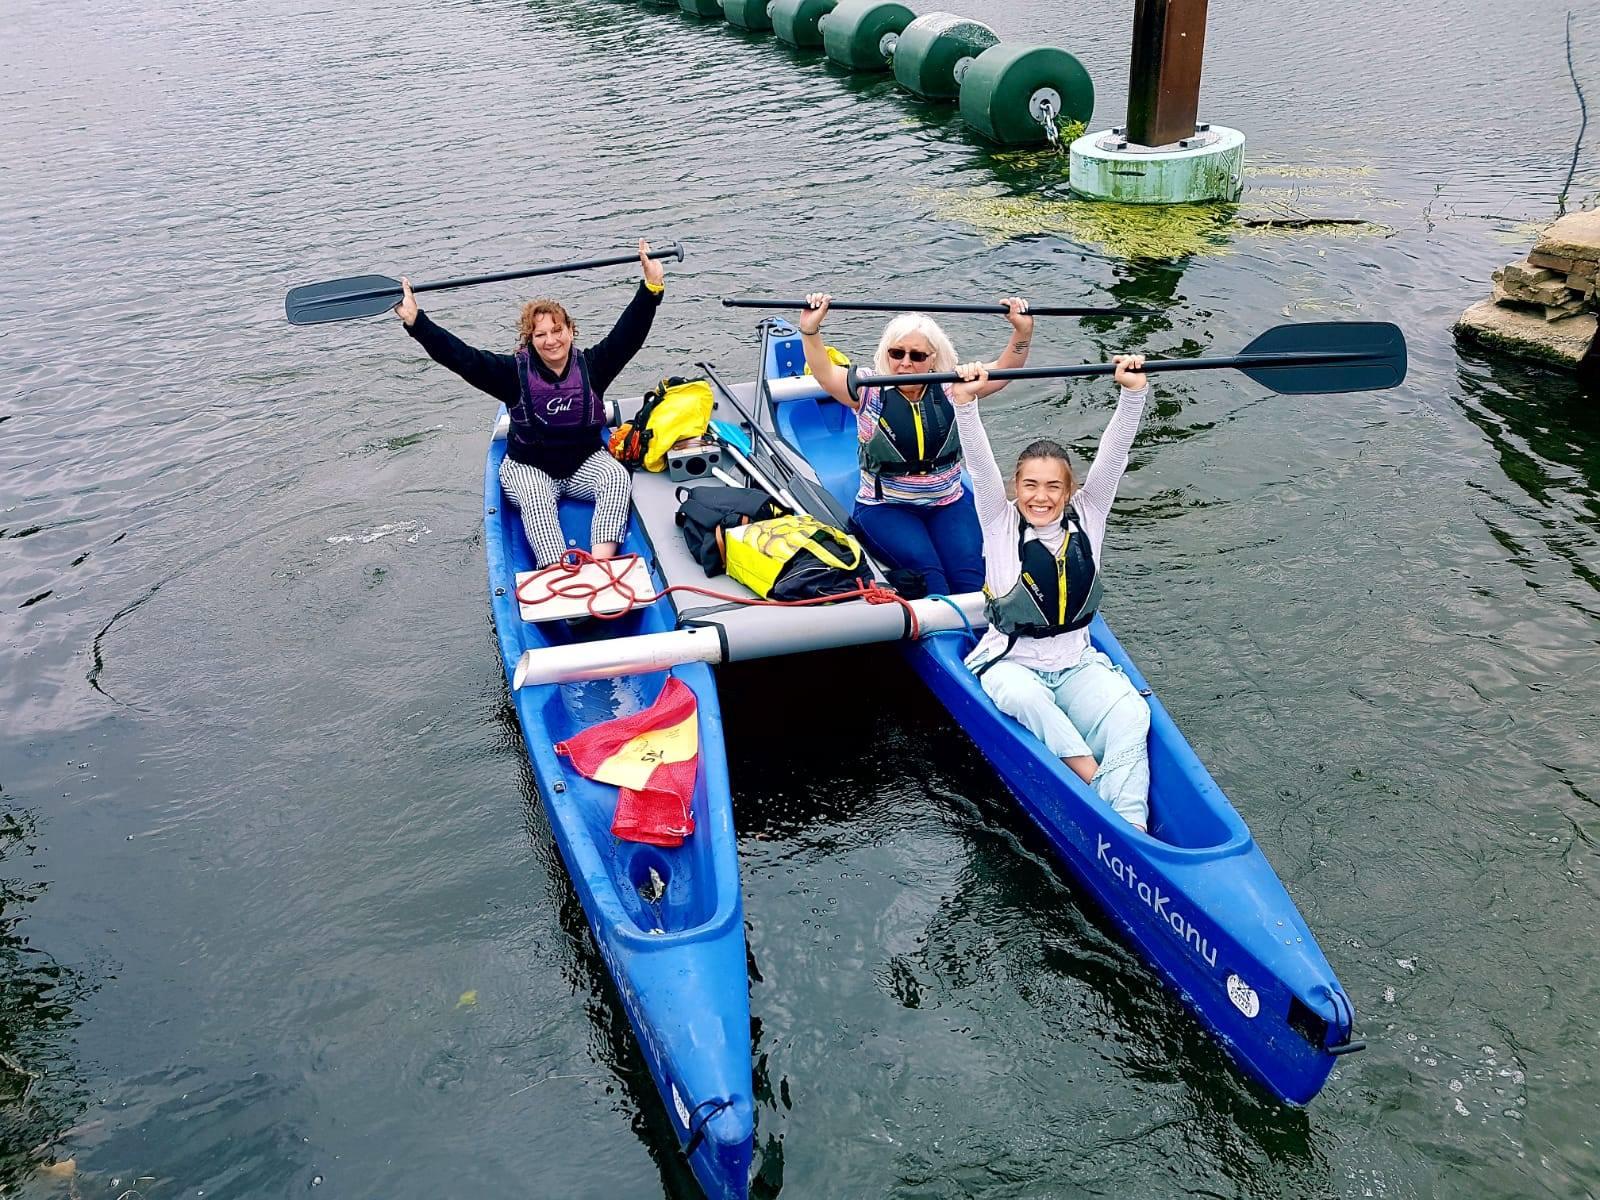 Channel Kayaks | Katakanu adventures in Bristol and Bath